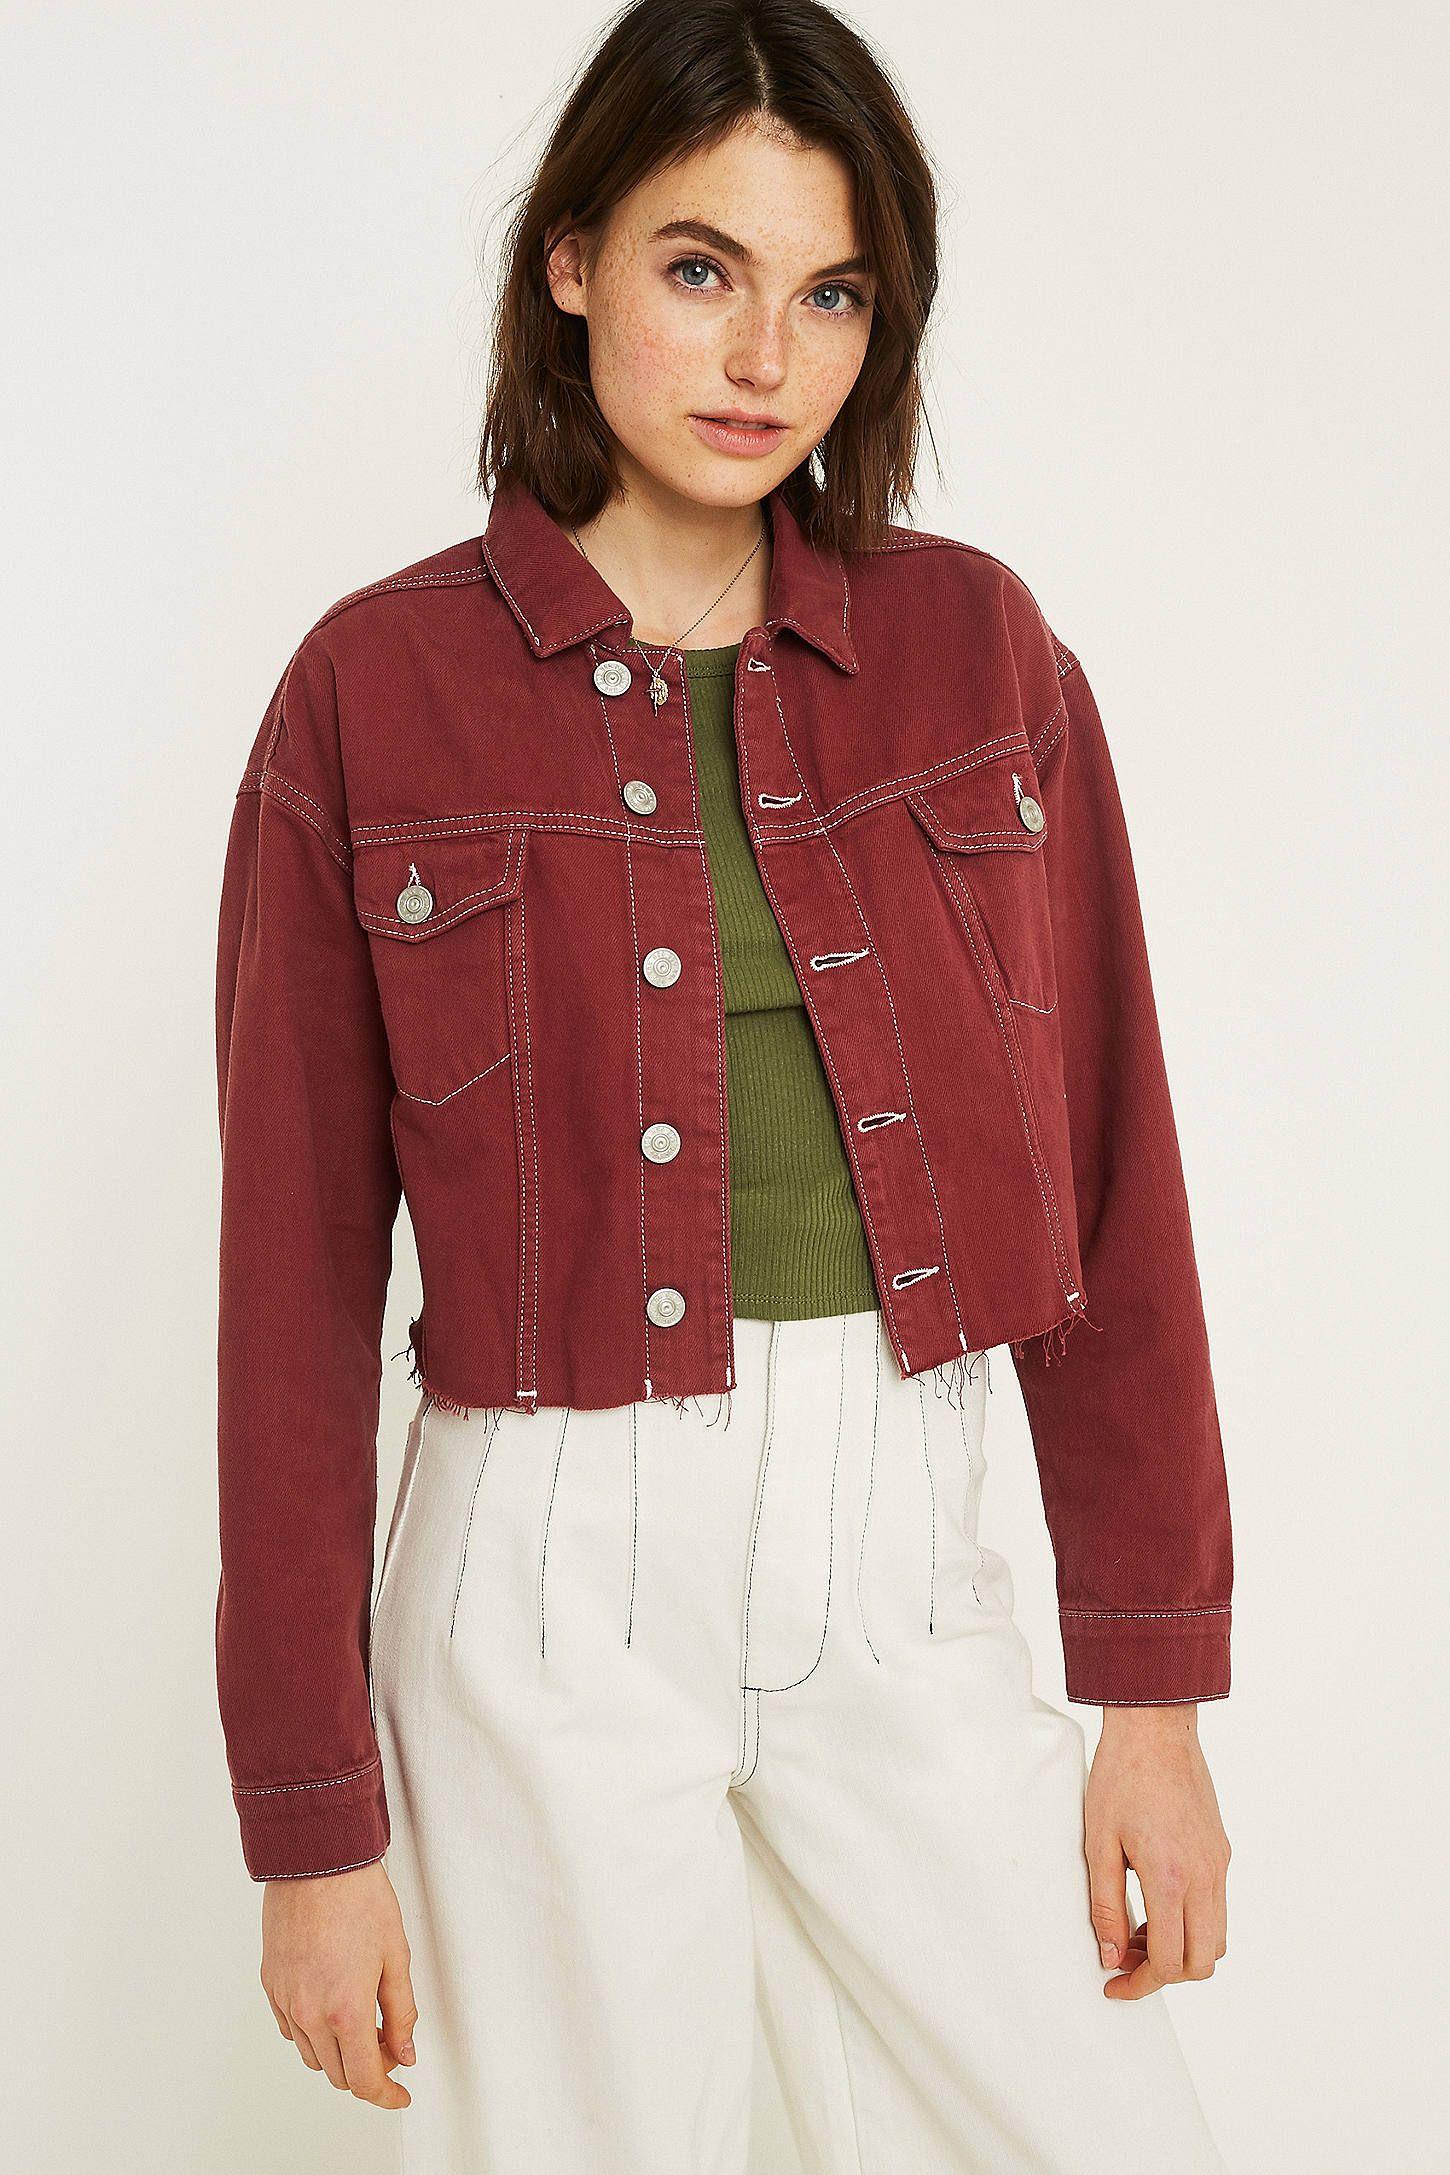 c491cfd0debf1 UO Contrast Stitch Pink Crop Denim Jacket | Fashion | Cropped denim ...